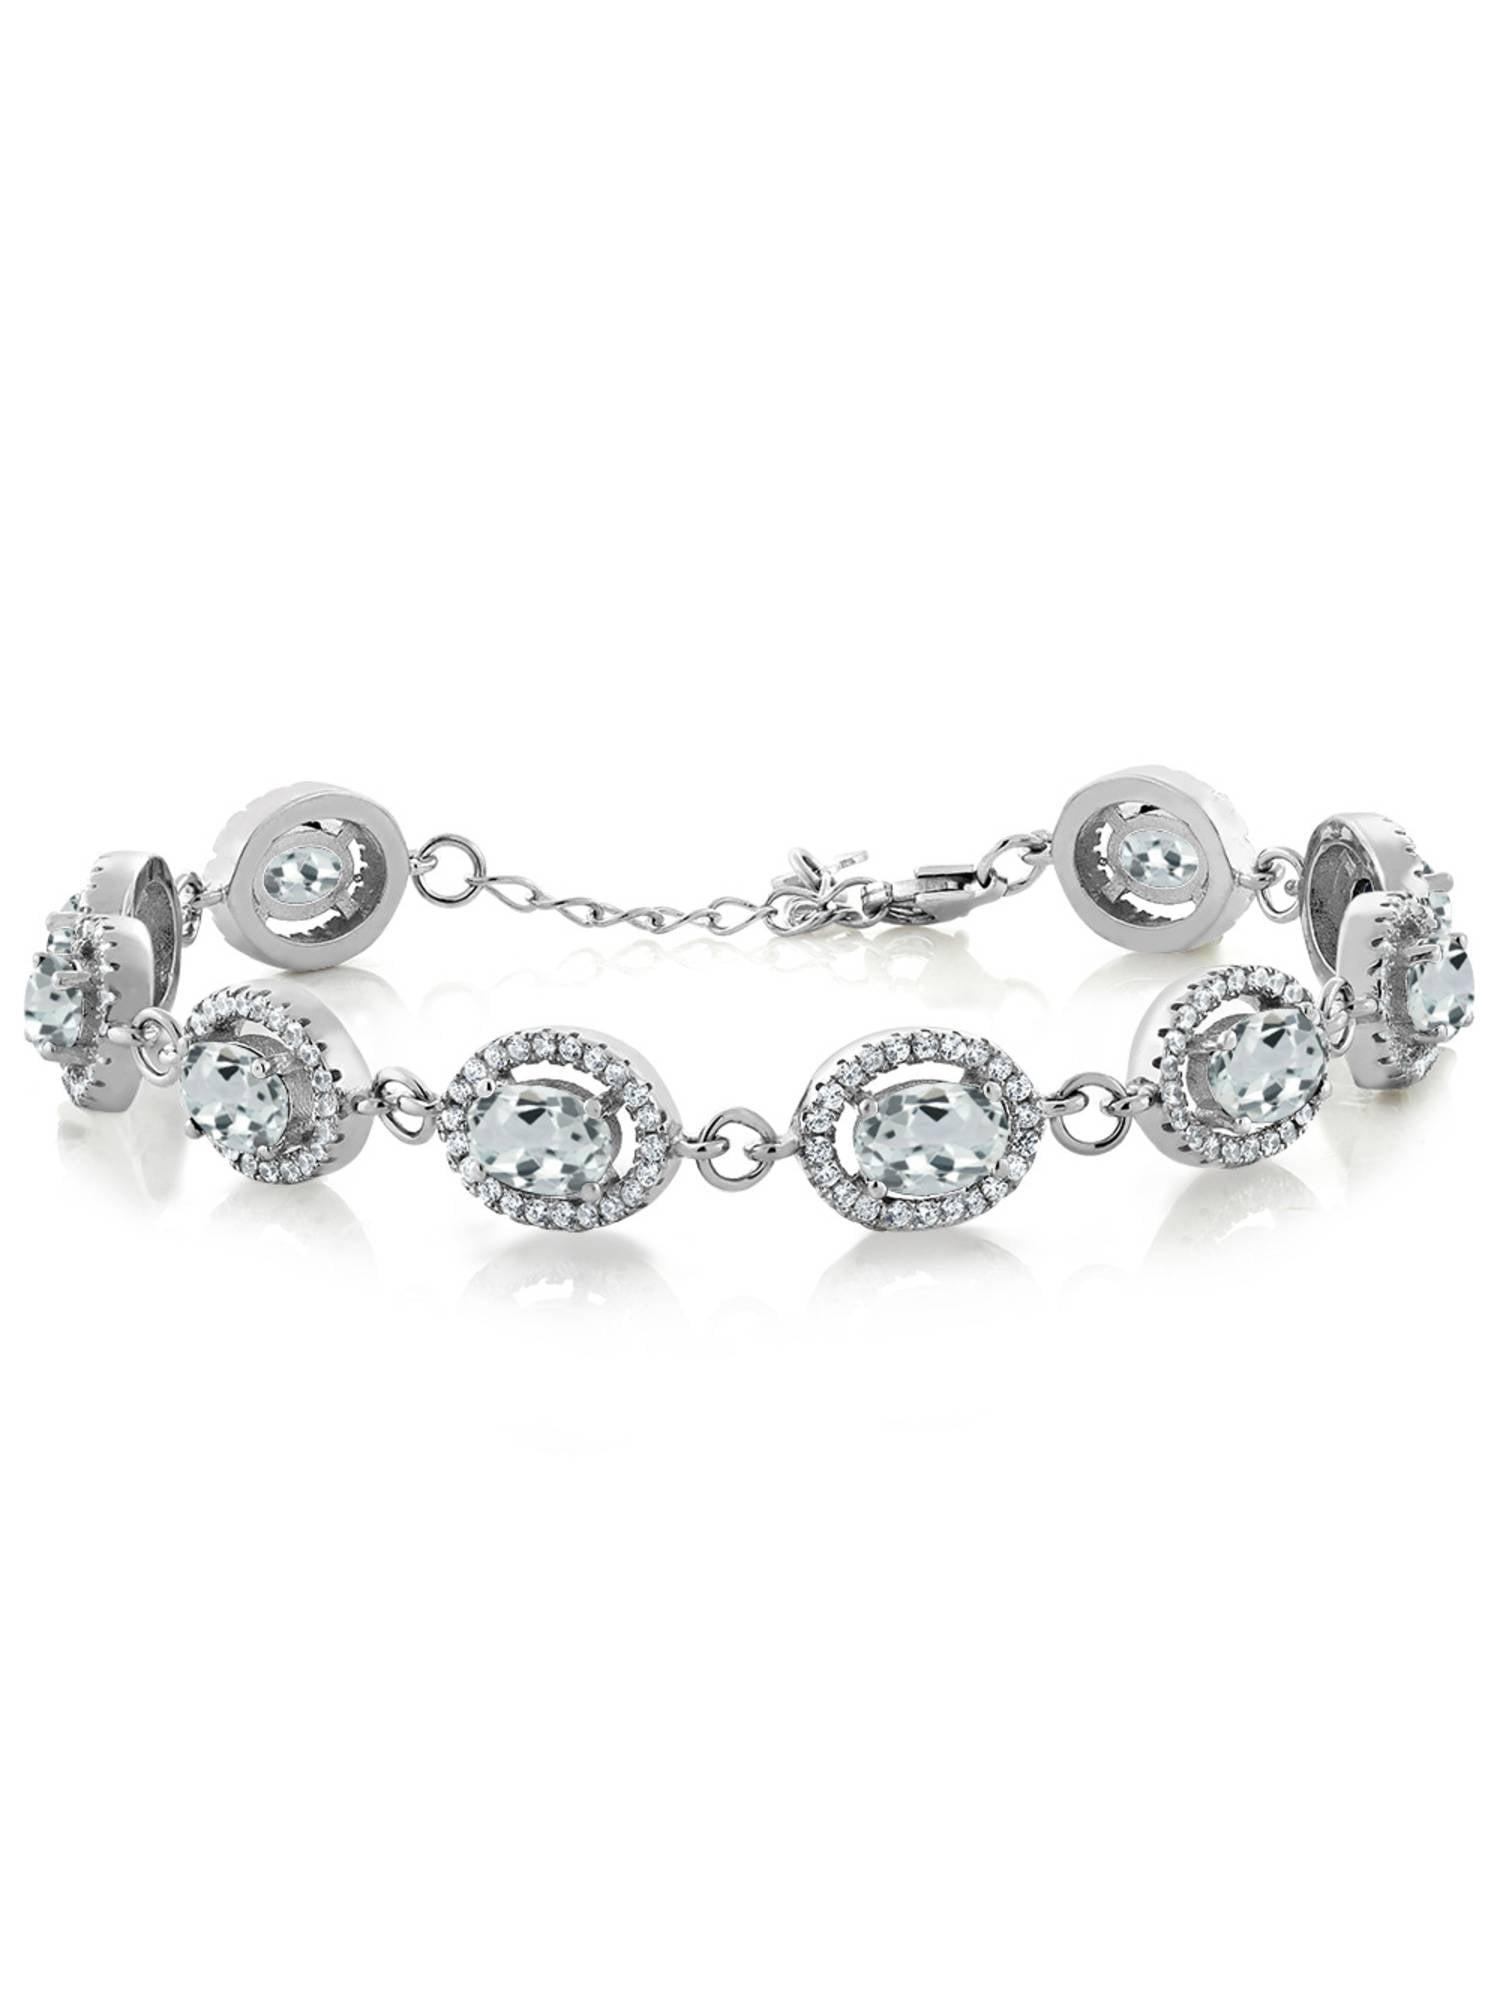 10.08 Ct Oval Sky Blue Aquamarine 925 Sterling Silver Bracelet by